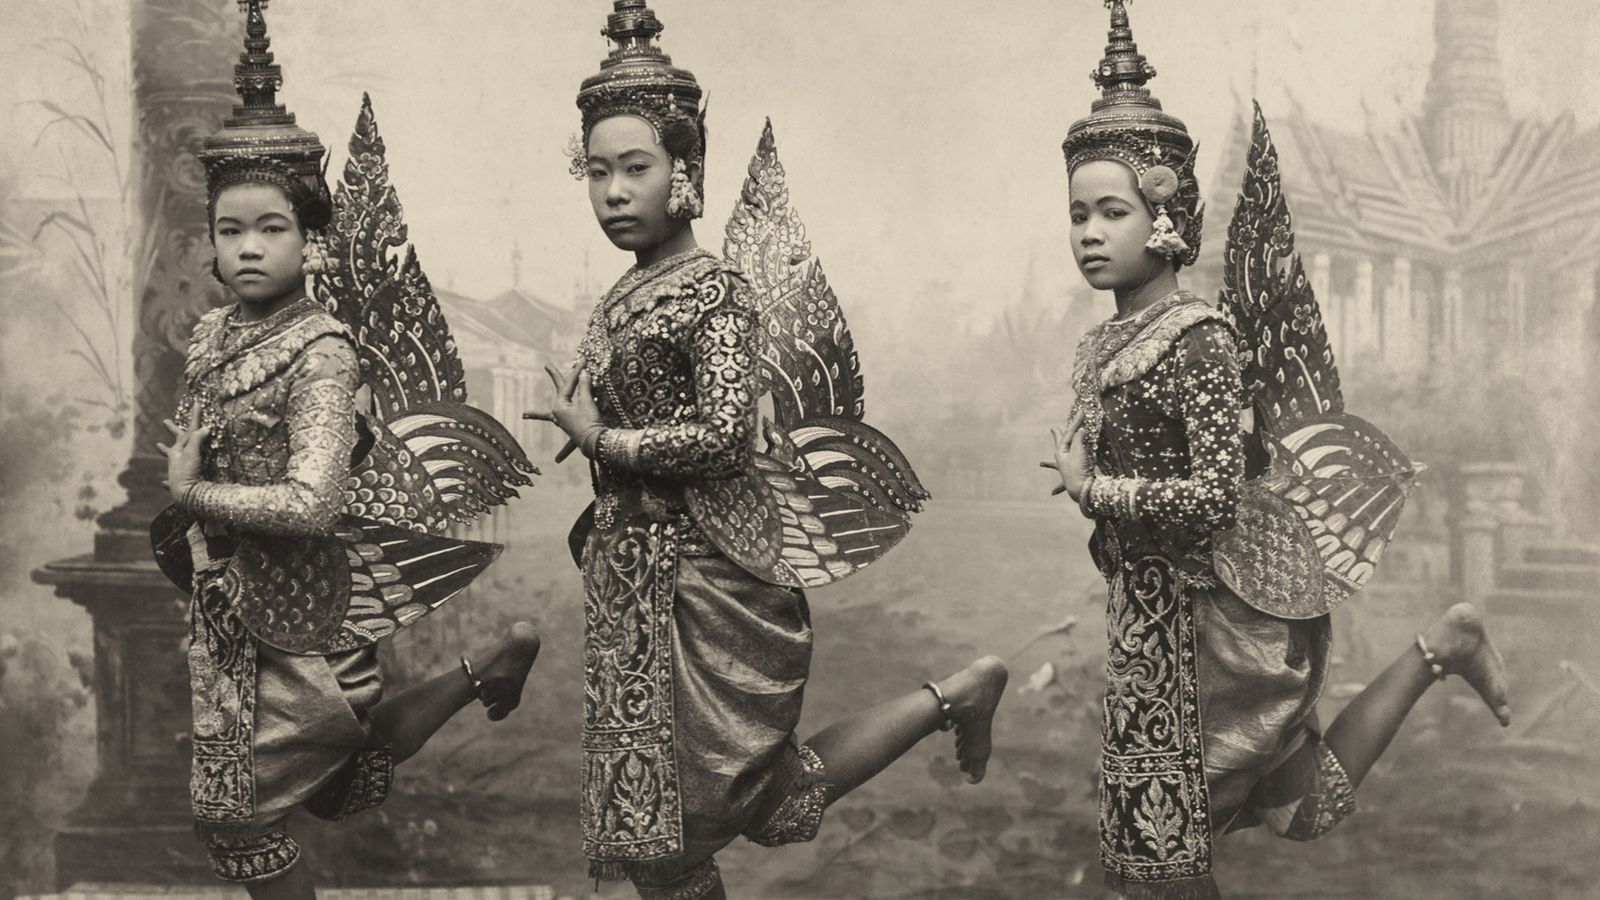 Kulturelle Vertreterinnen